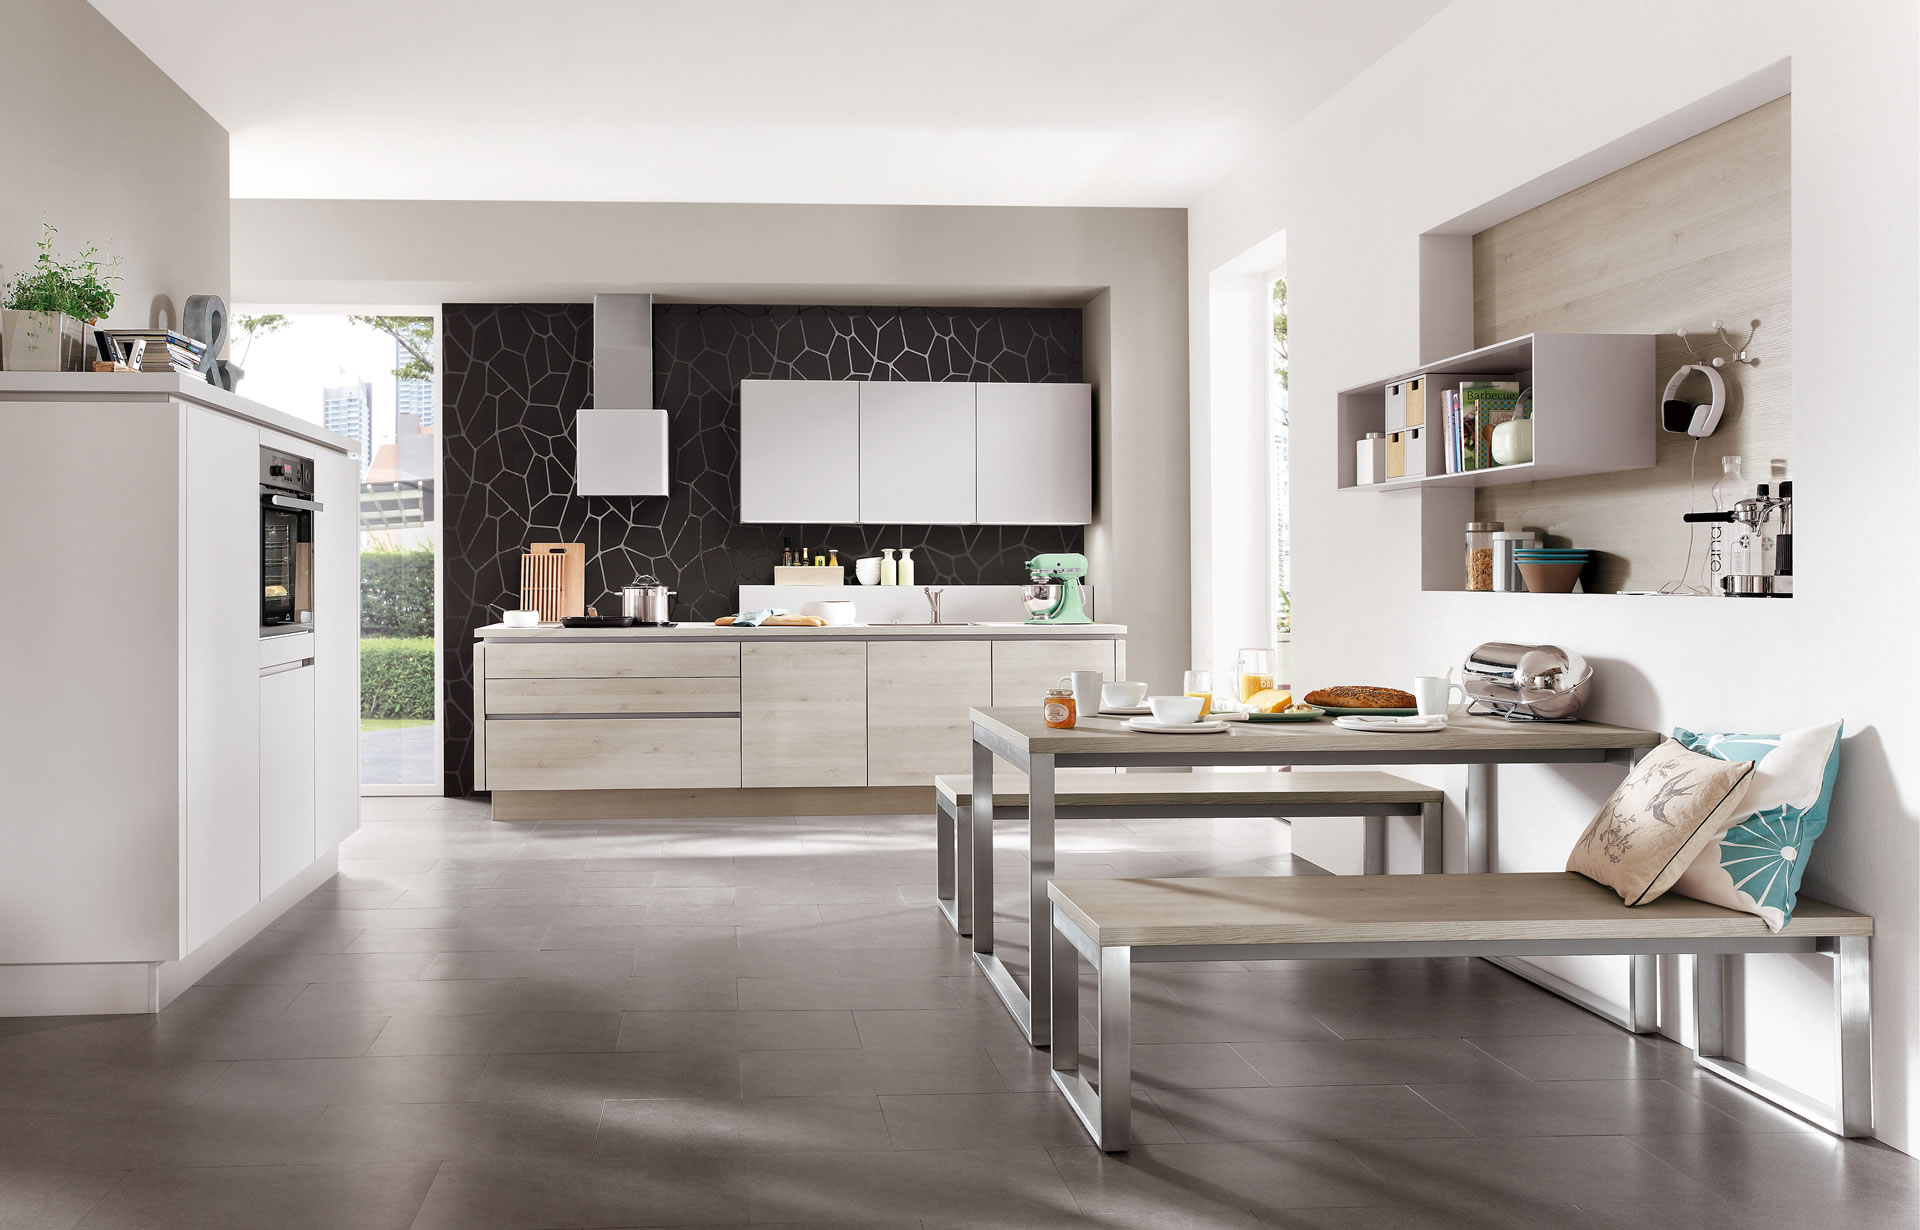 Beautiful Nobilia Küche Online Planen Ideas - Ridgewayng.com ...